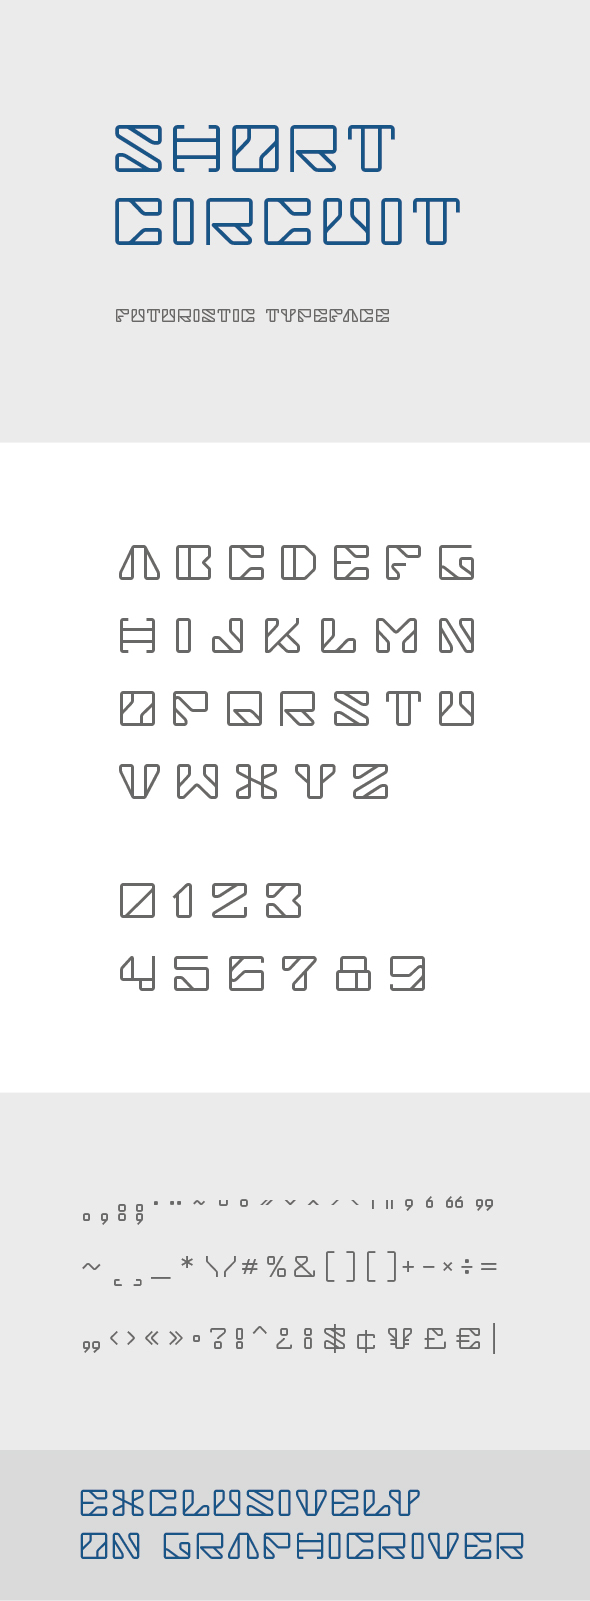 Short Circuit Futuristic Font - Futuristic Decorative